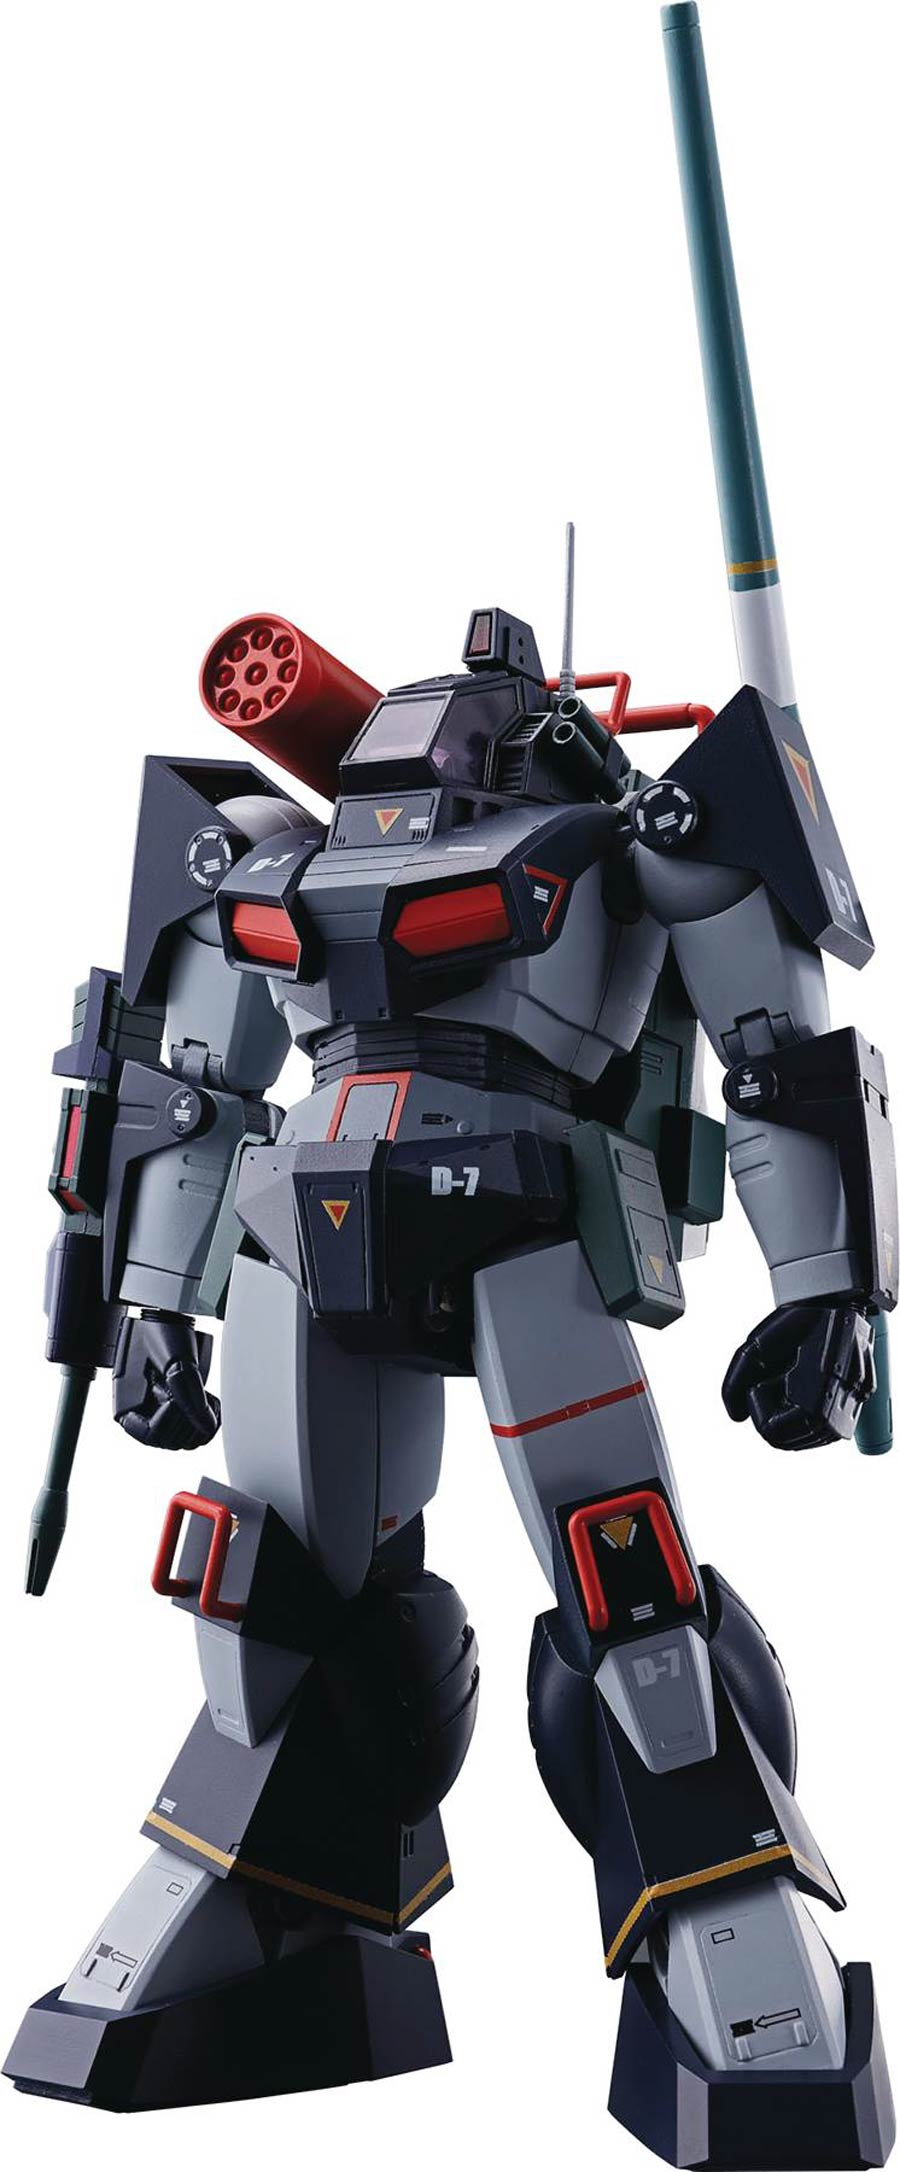 Combat Armor Dougram Hi-Metal R - Dougram Action Figure